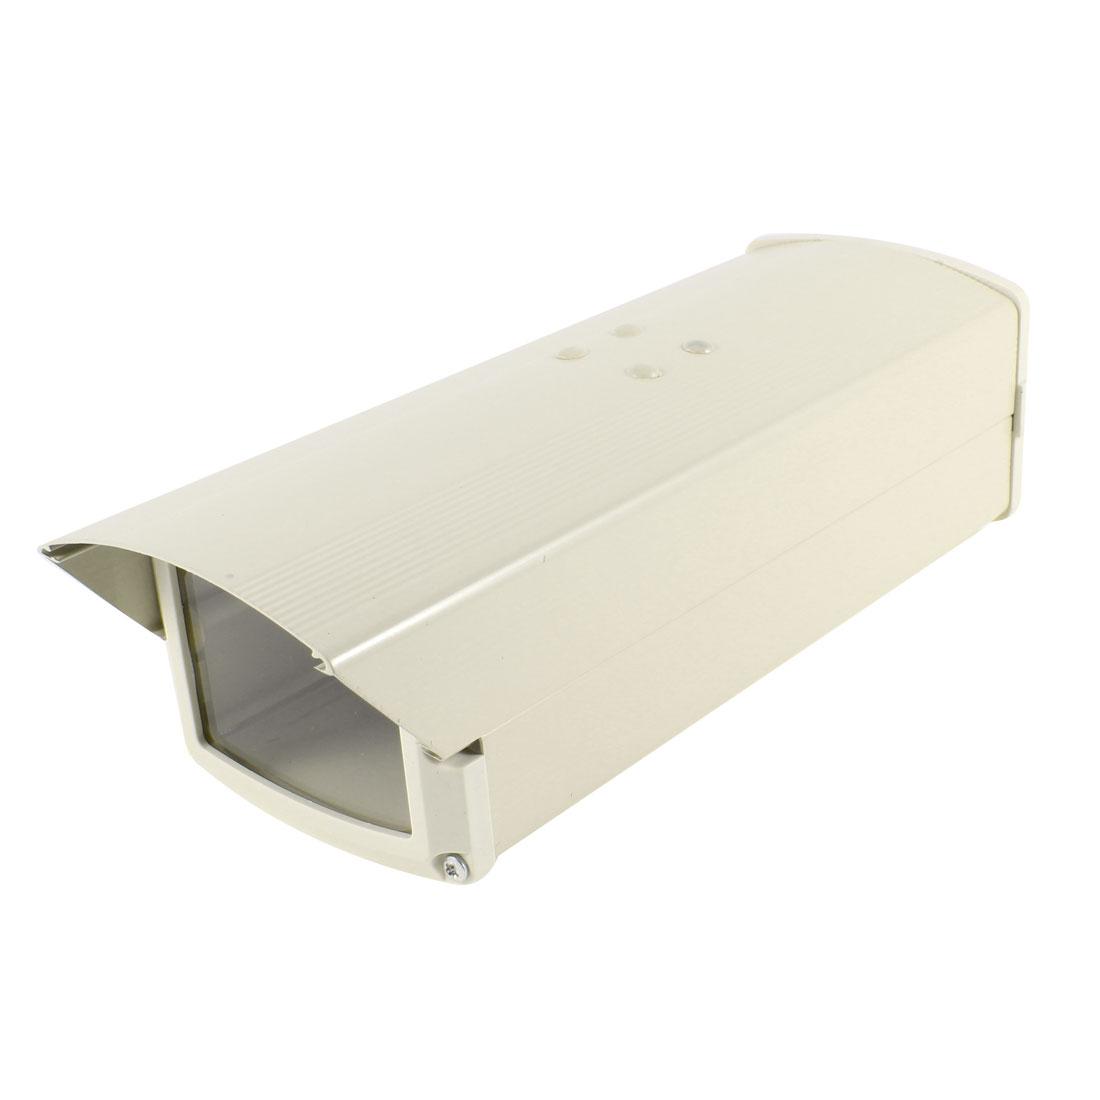 "9.5"" x 3.5"" x 3"" Outdoor External Protector Silver Tone Camera Housing Cover"